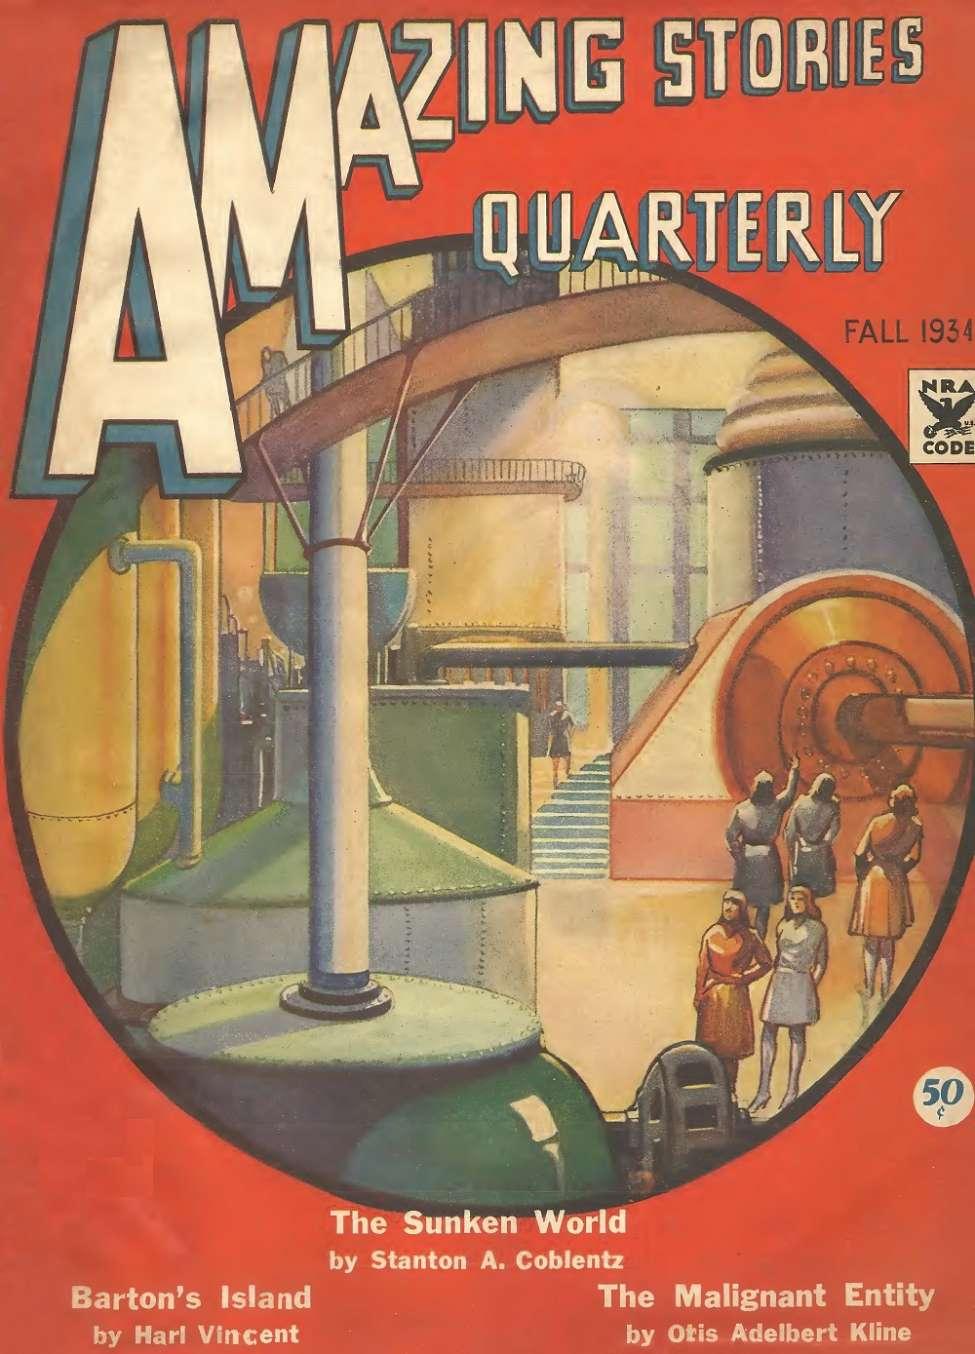 Comic Book Cover For Amazing Stories Quarterly v7 02 - The Sunken World - Stanton A. Coblentz